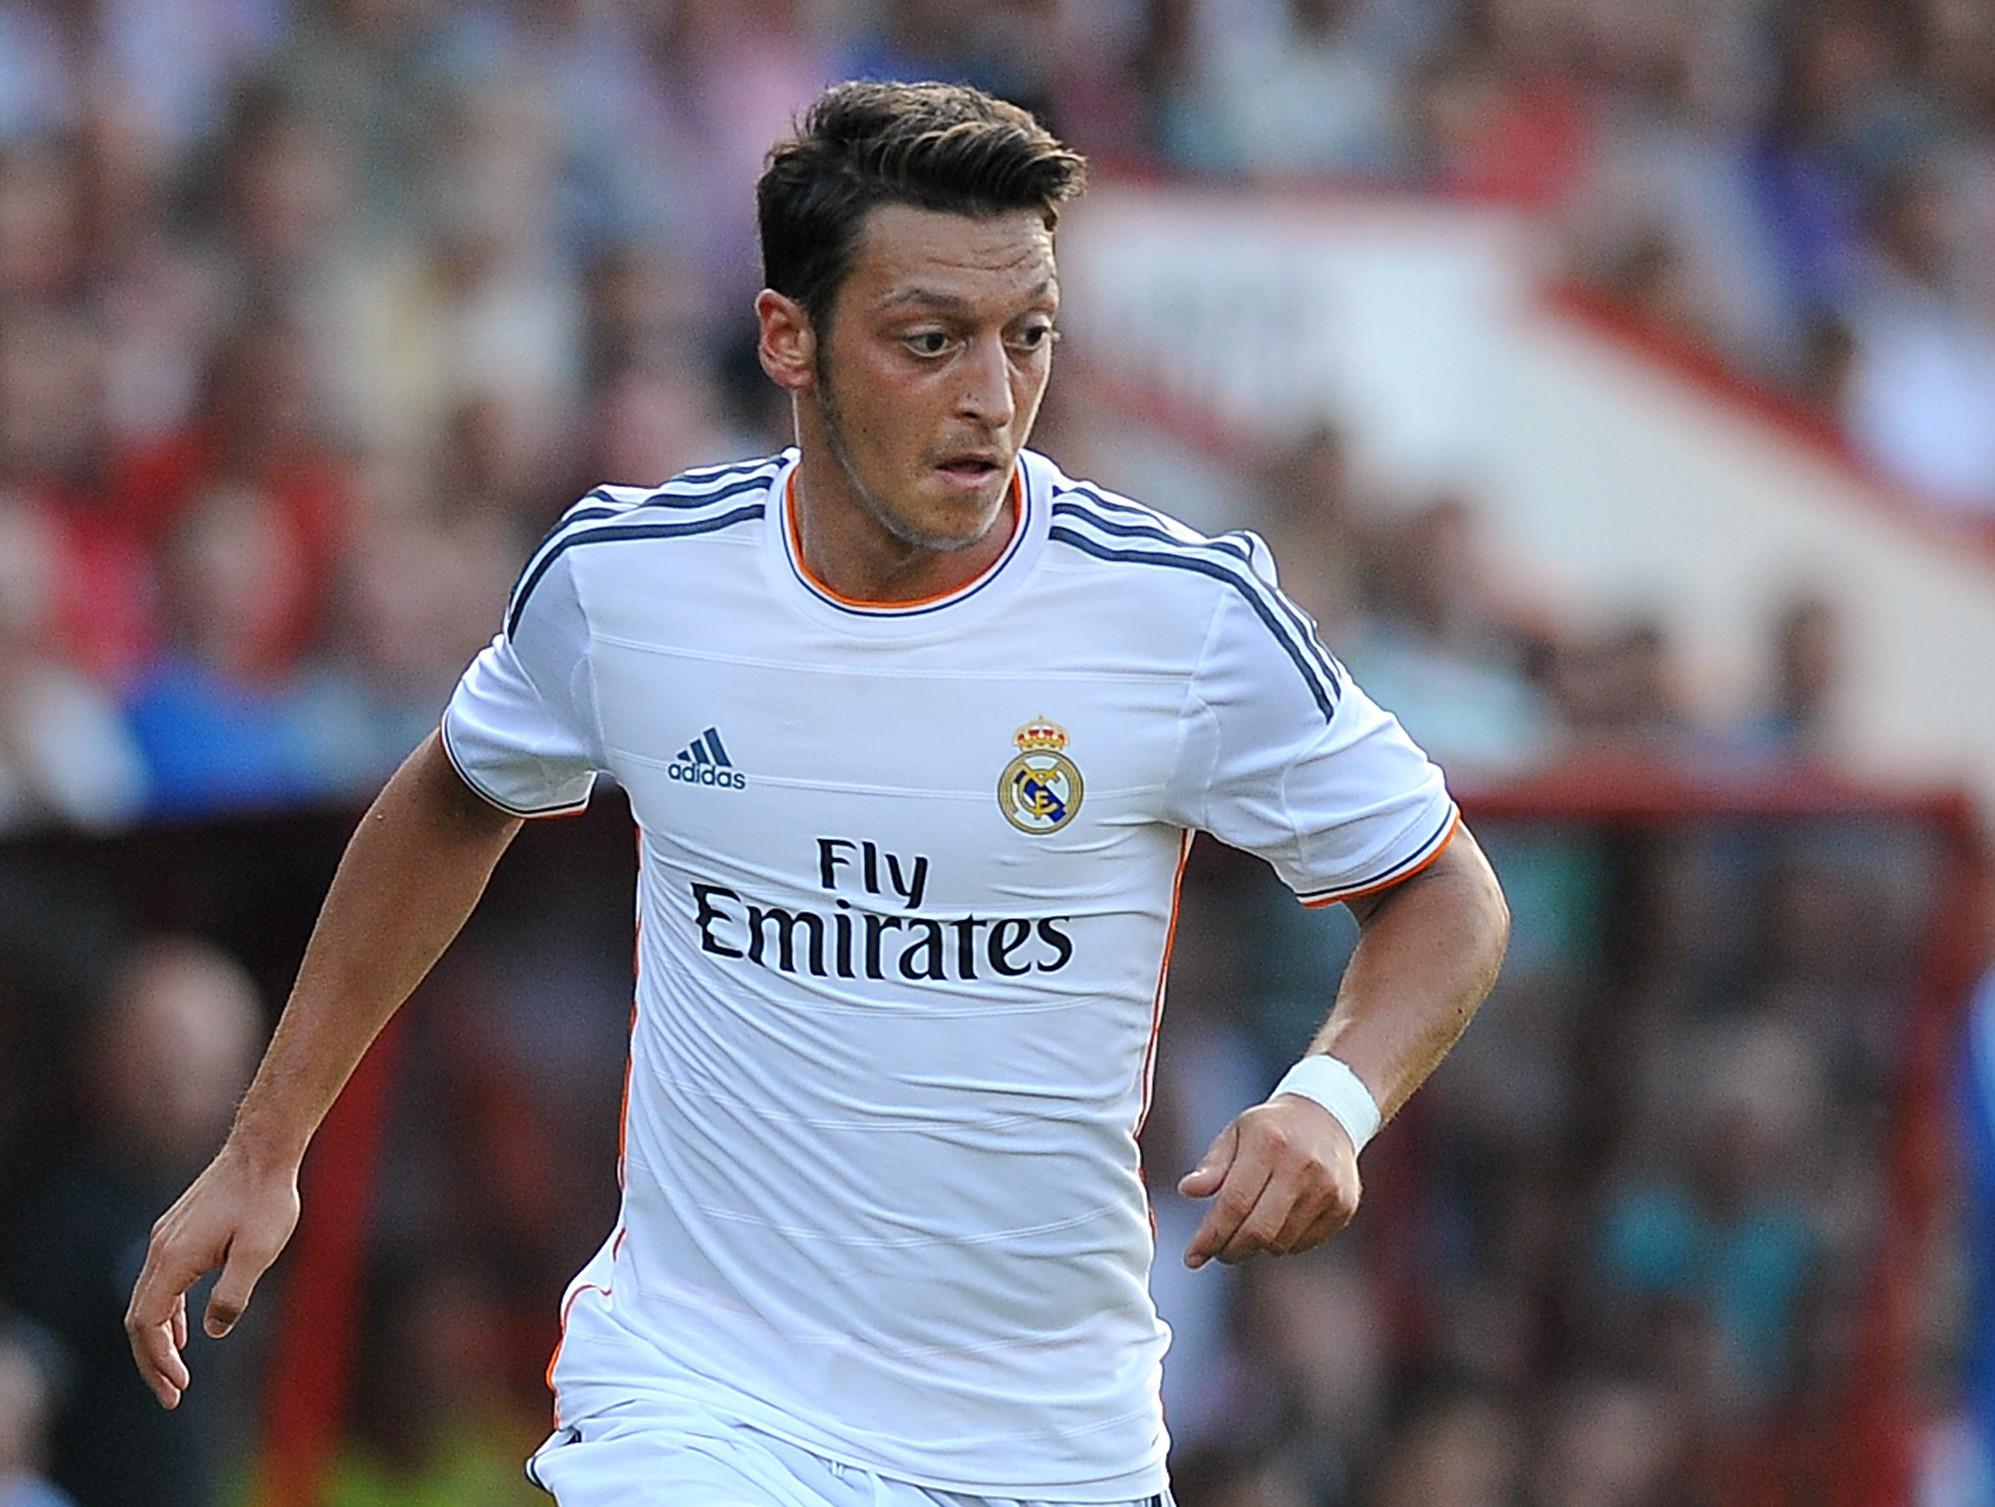 Mesut Ozil set to sue Real Madrid president Florentino Perez over 'unprofessional' jibe